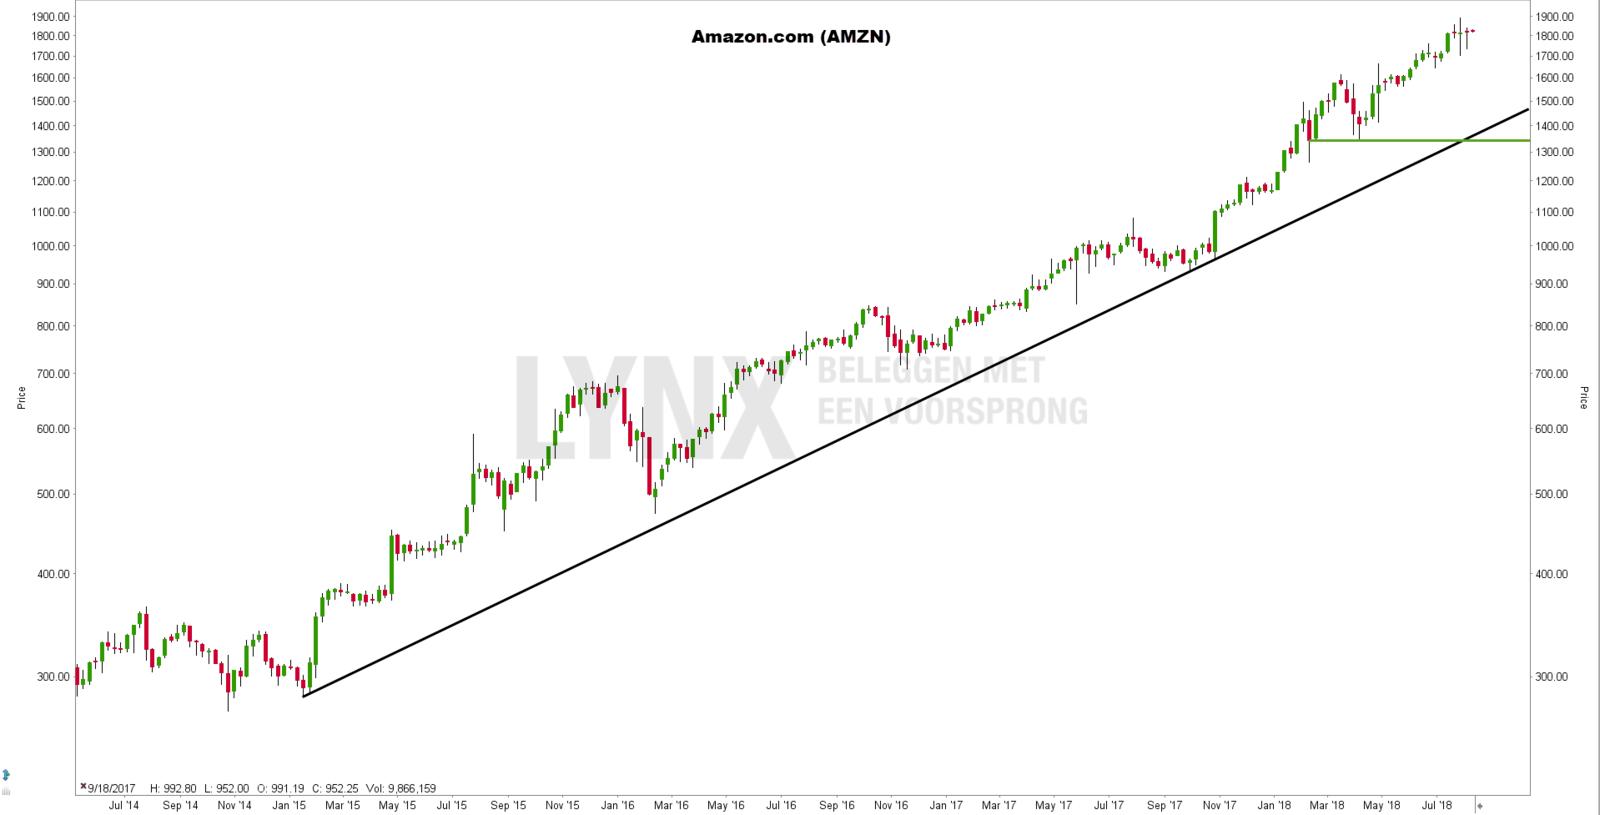 FANG aandeel Amazon